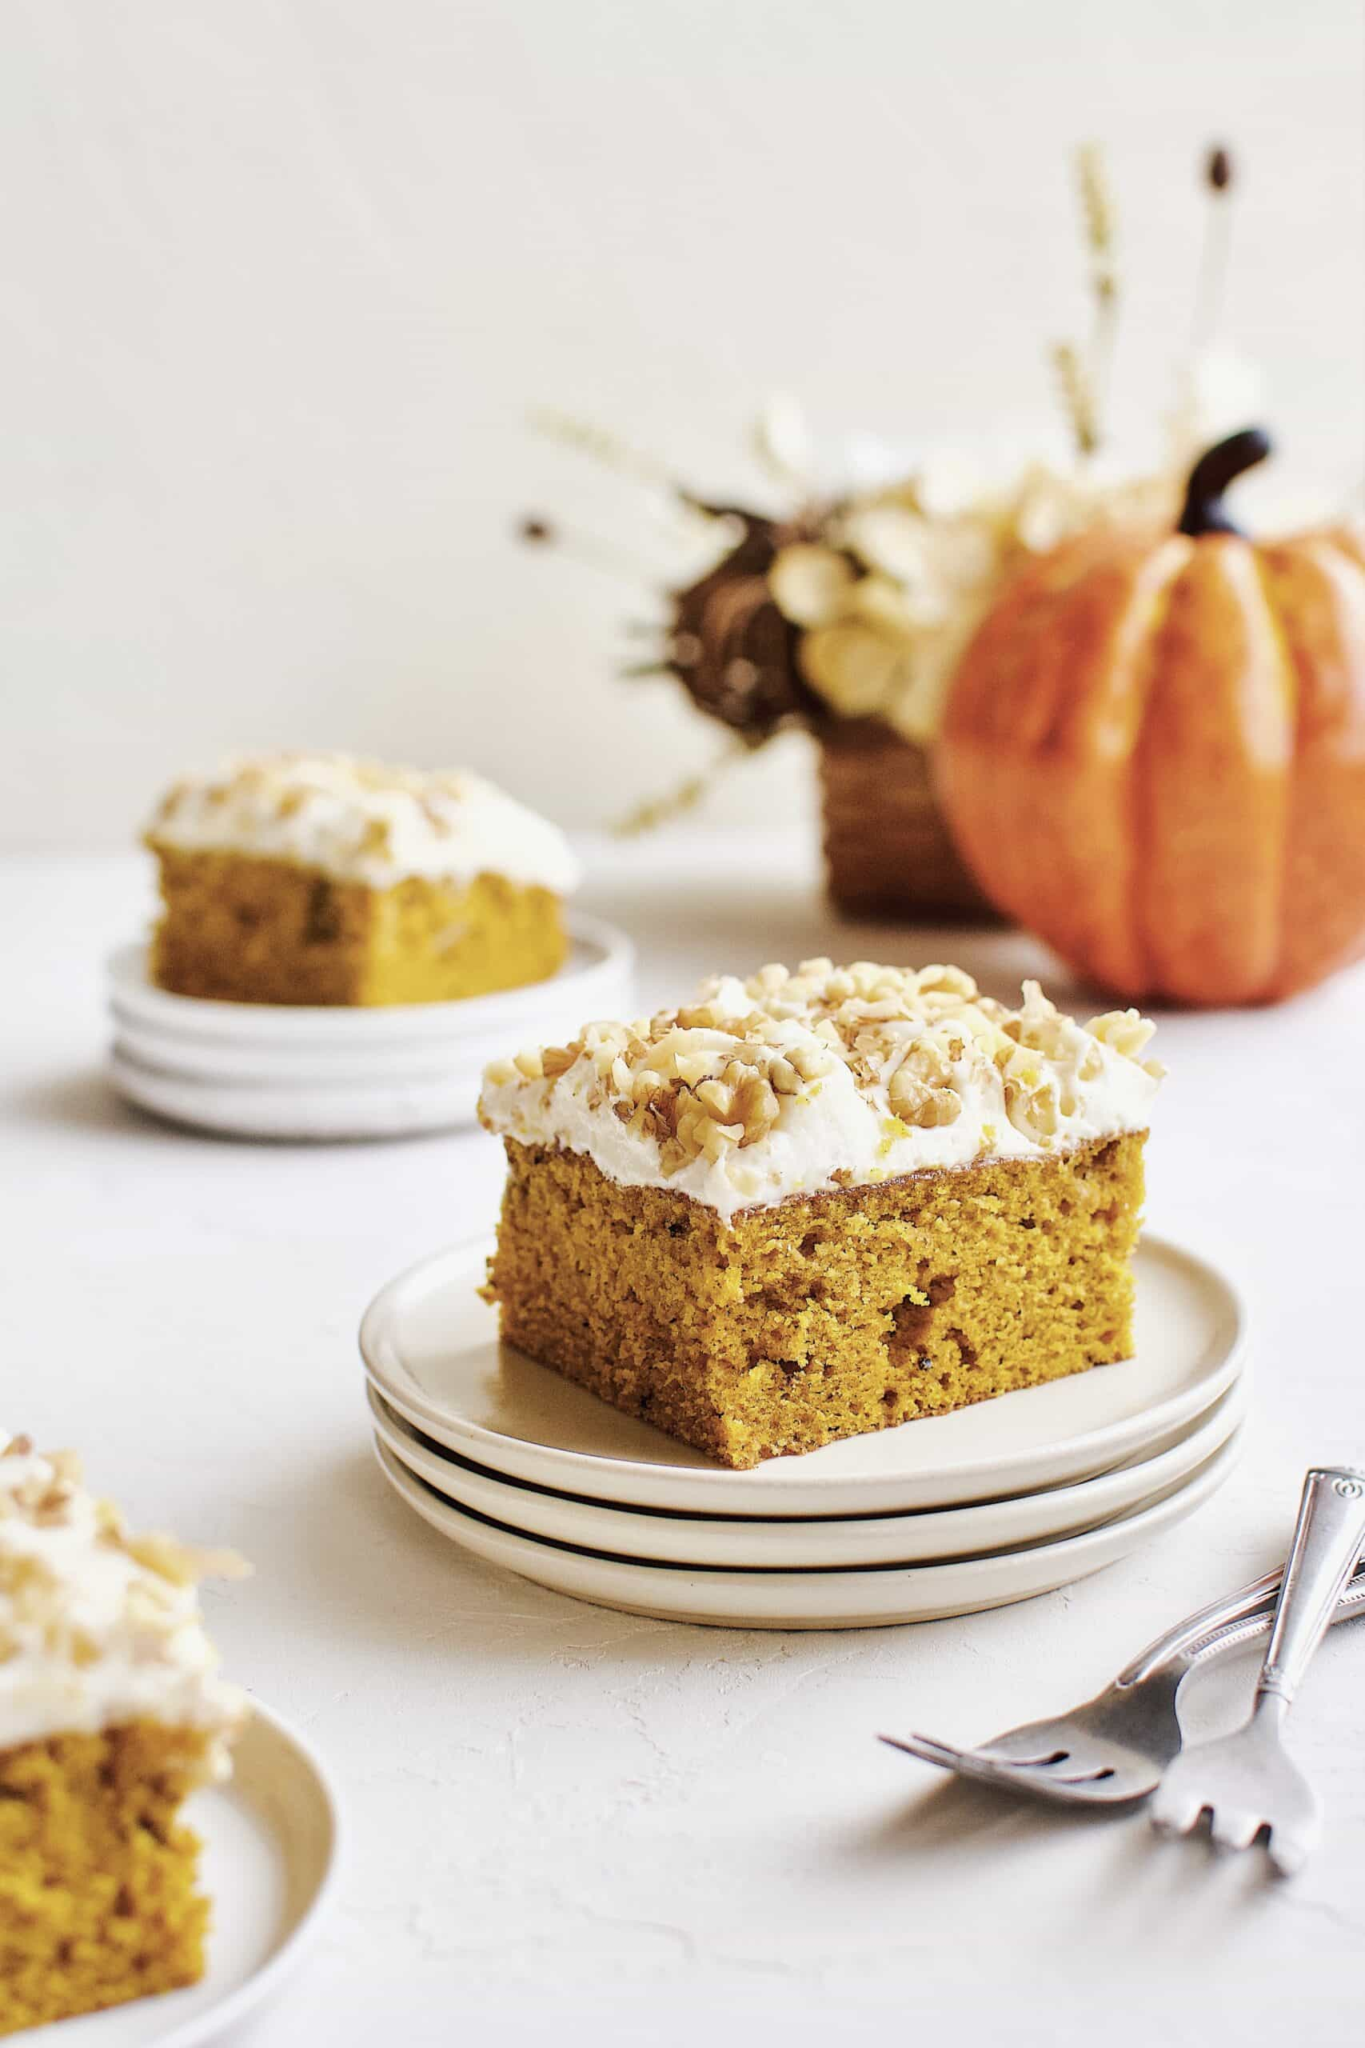 Pumpkin Cake sliced and ready to serve